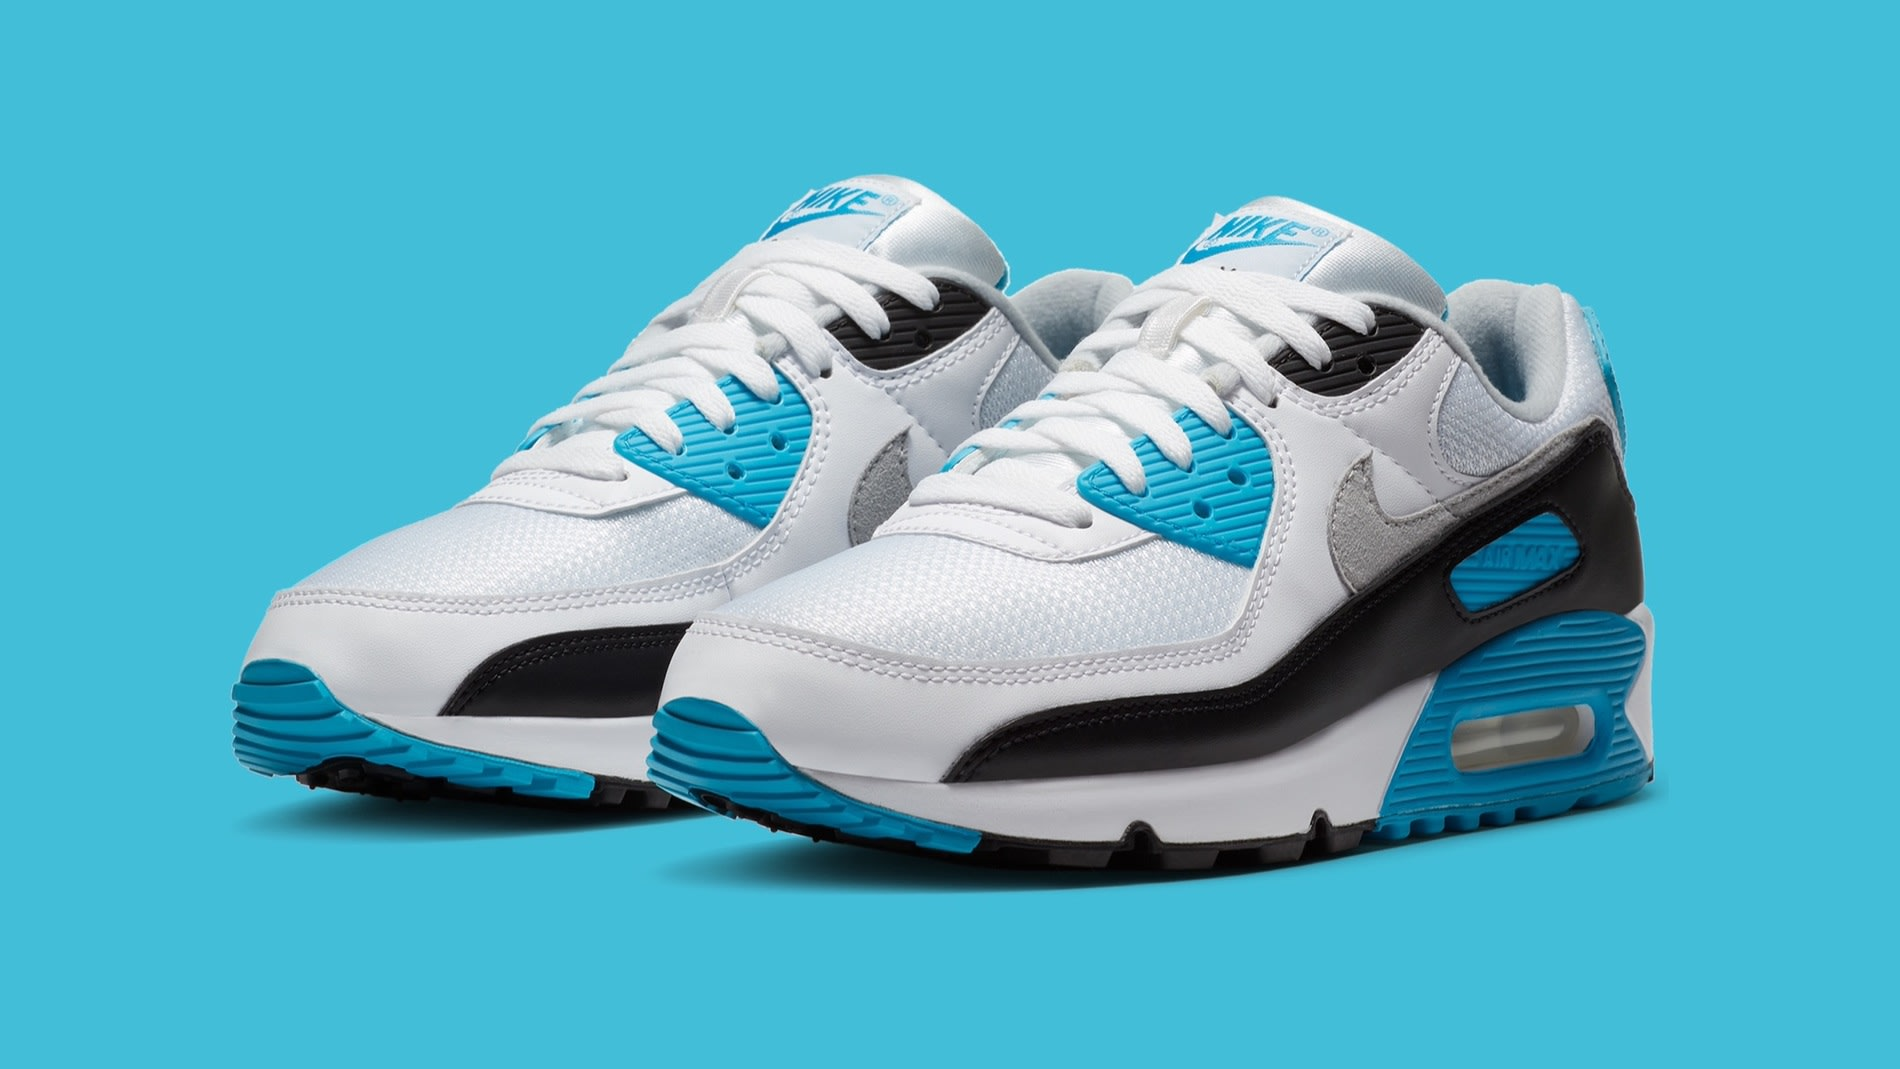 Nike Air Max III - 'Laser Blue'